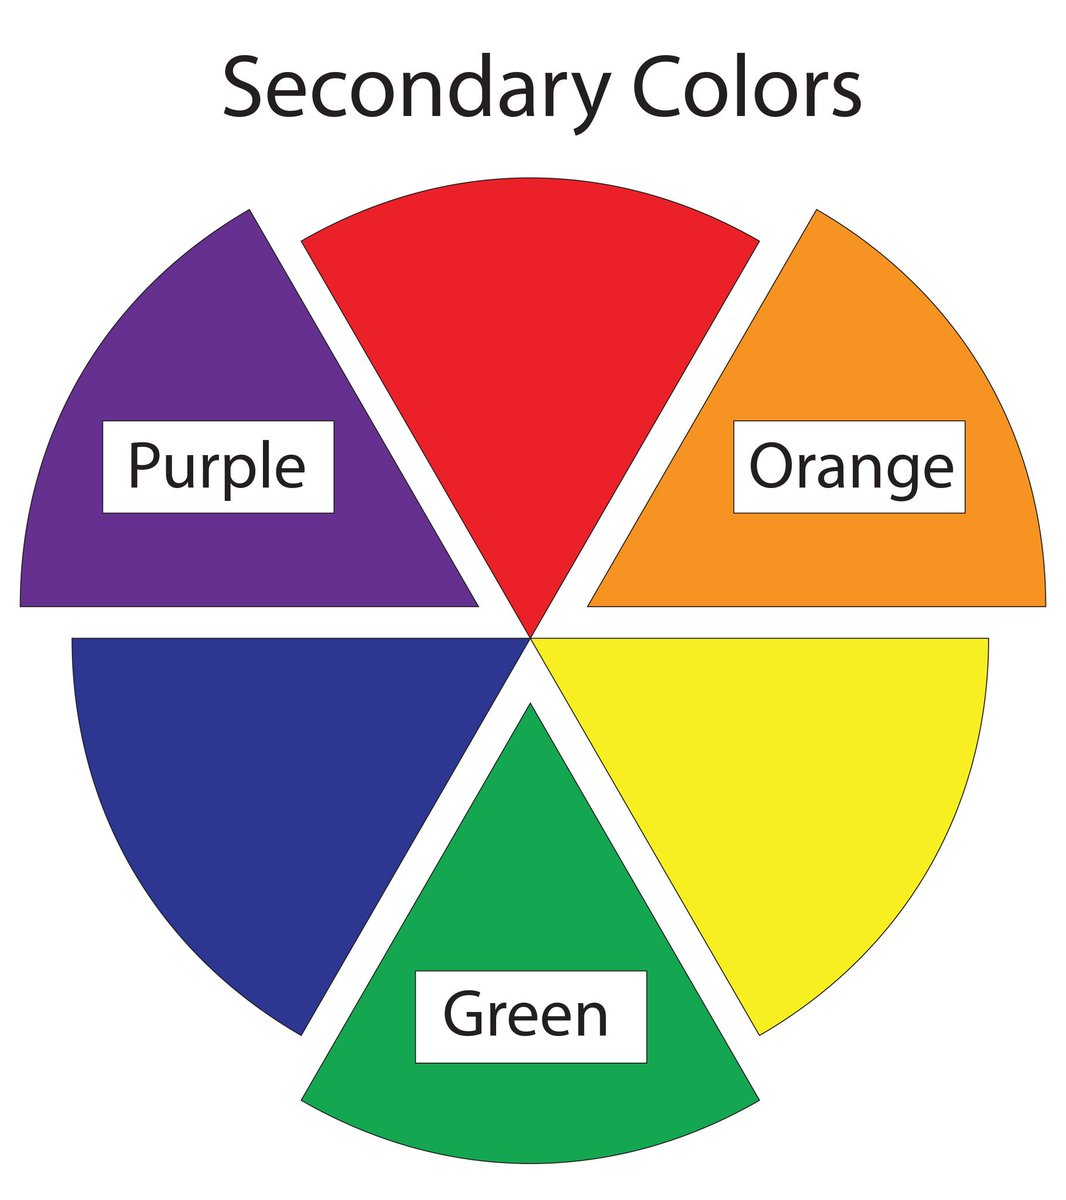 E k k i f i t r i a n i firianyeqy twitter warna sekunder hijau oranye ungu pada karakter musuhvillainsmonsterpicitterdrutkhlv4l ccuart Images